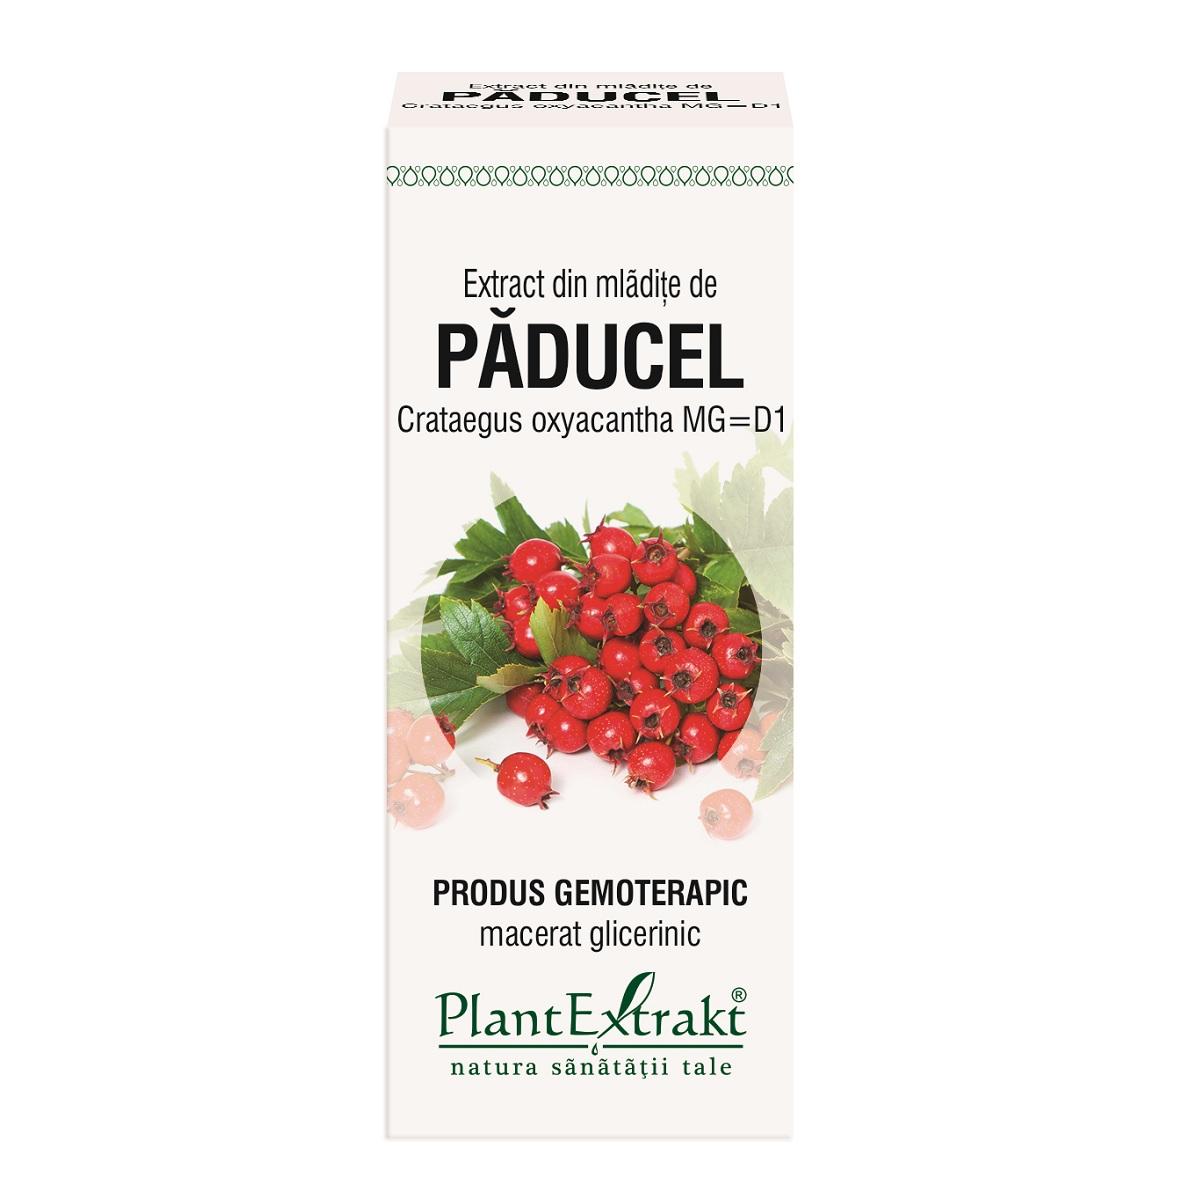 Extract din mladite de paducel, 50ml, Plant Extrakt drmax.ro